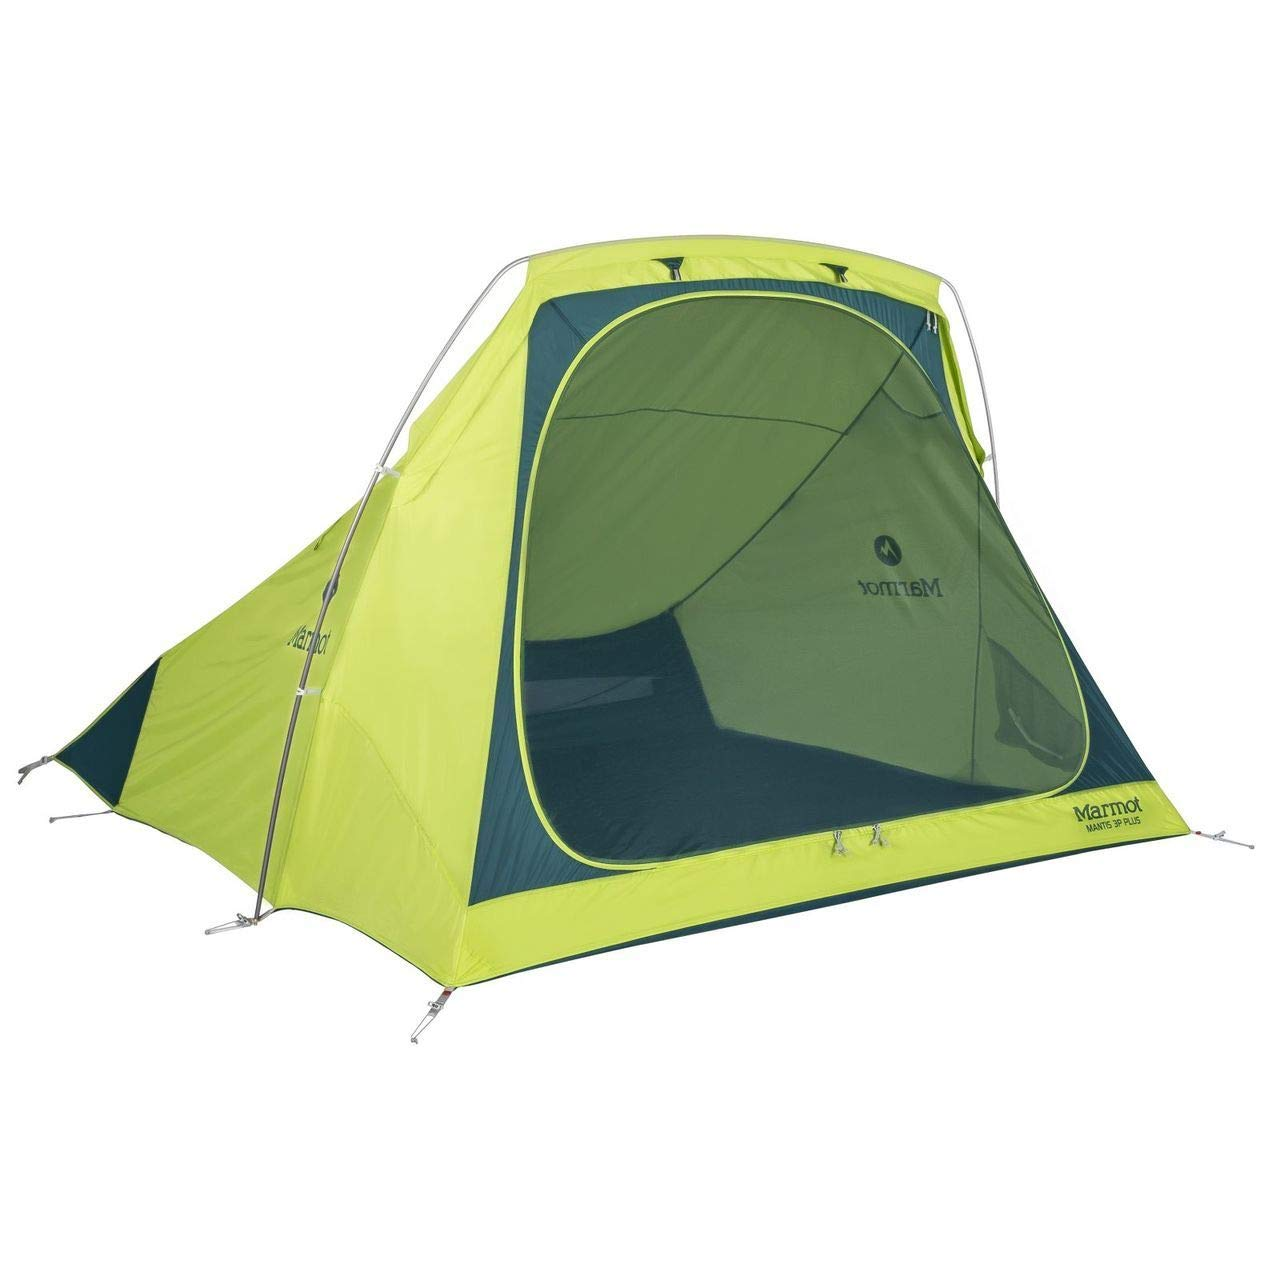 Marmot グリーン Mantis One 3pプラステント One Size B07B5FHNCF グリーン B07B5FHNCF, 雑貨max:d62f971f --- ijpba.info